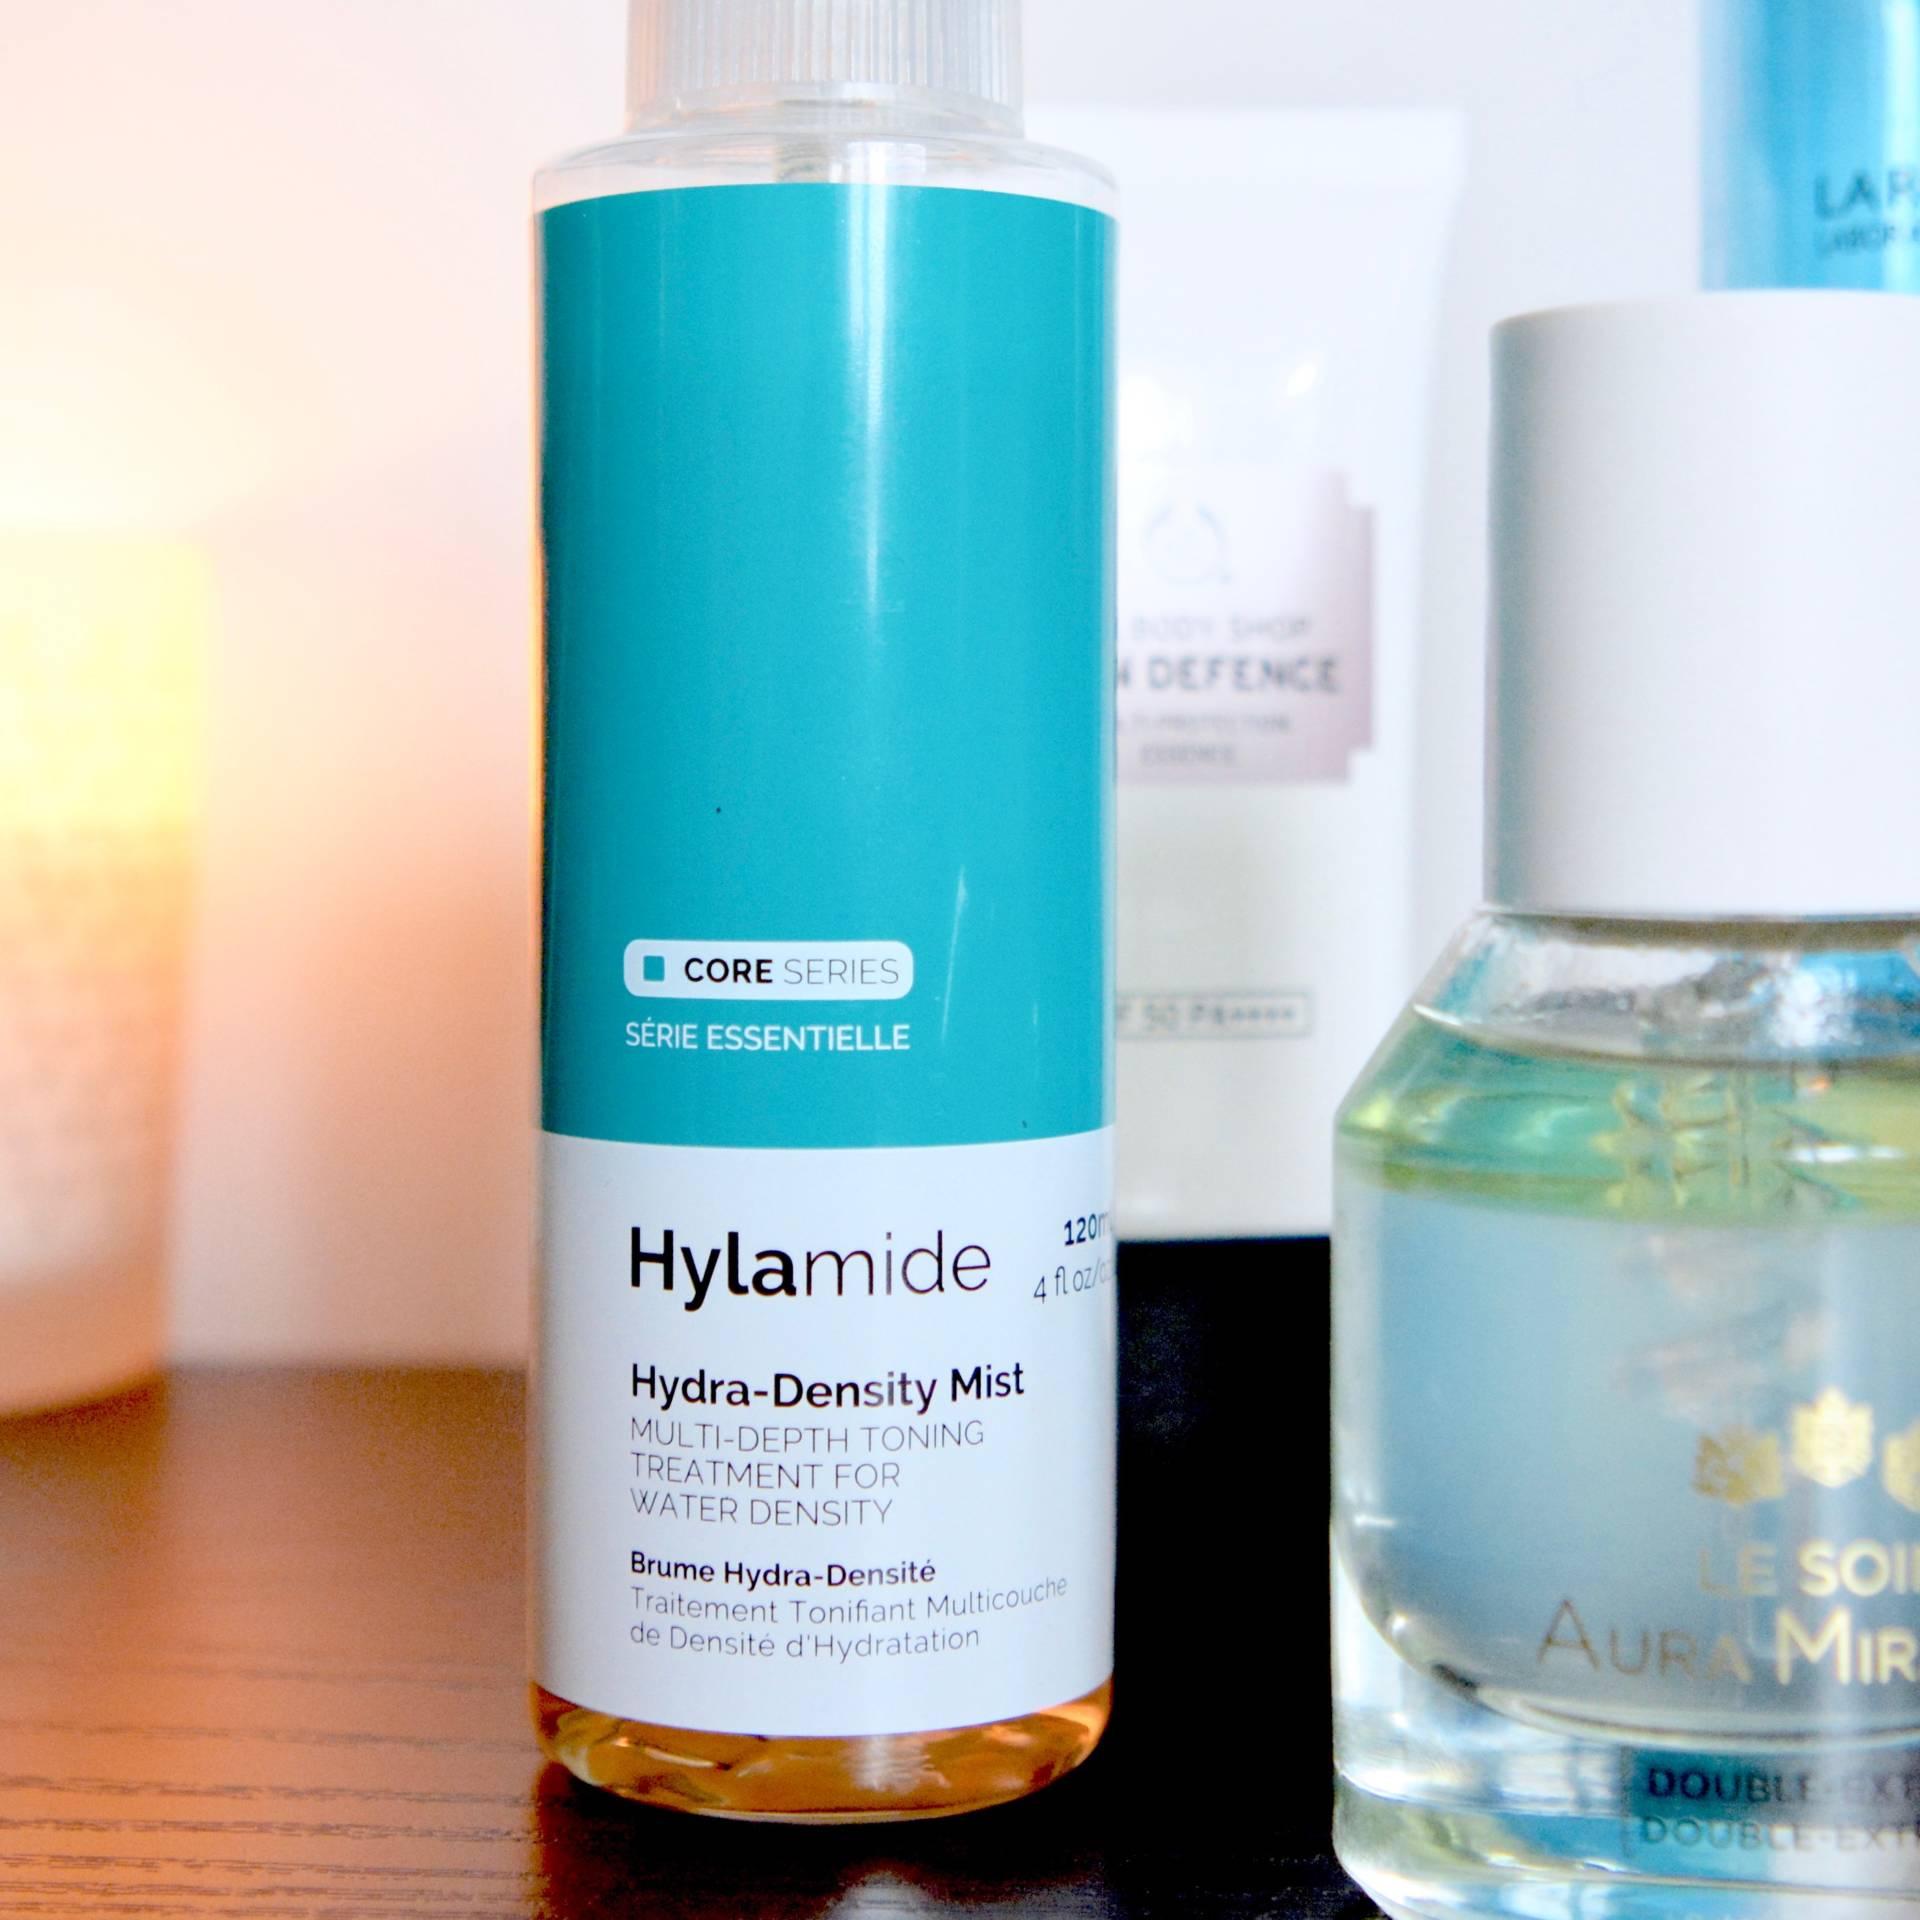 Skincare for rosacea and sensitive skin - Hylamide High Density Mist